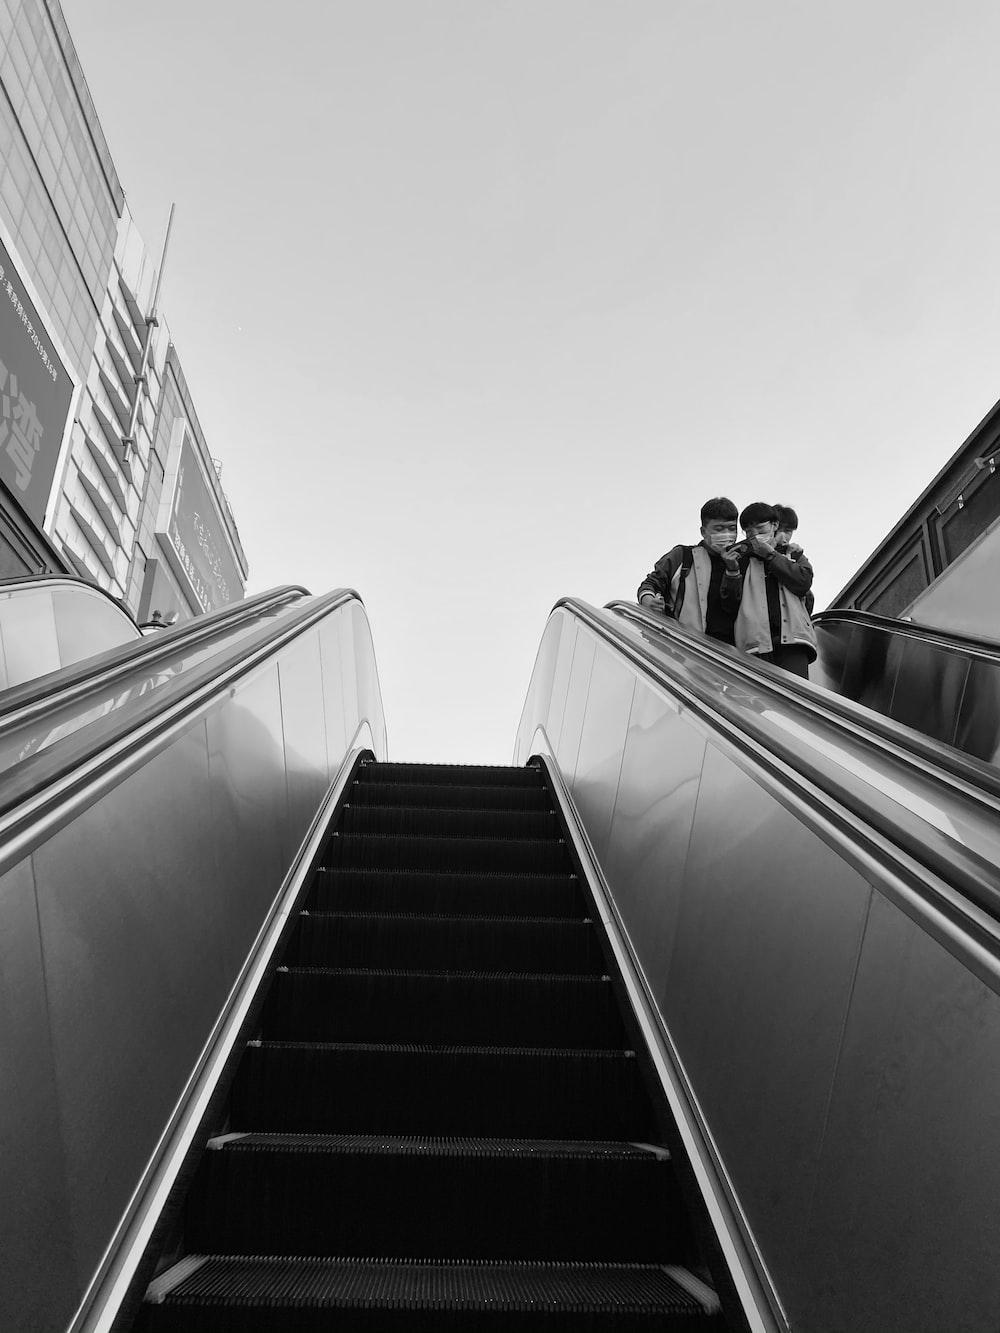 grayscale photo of 2 women on escalator